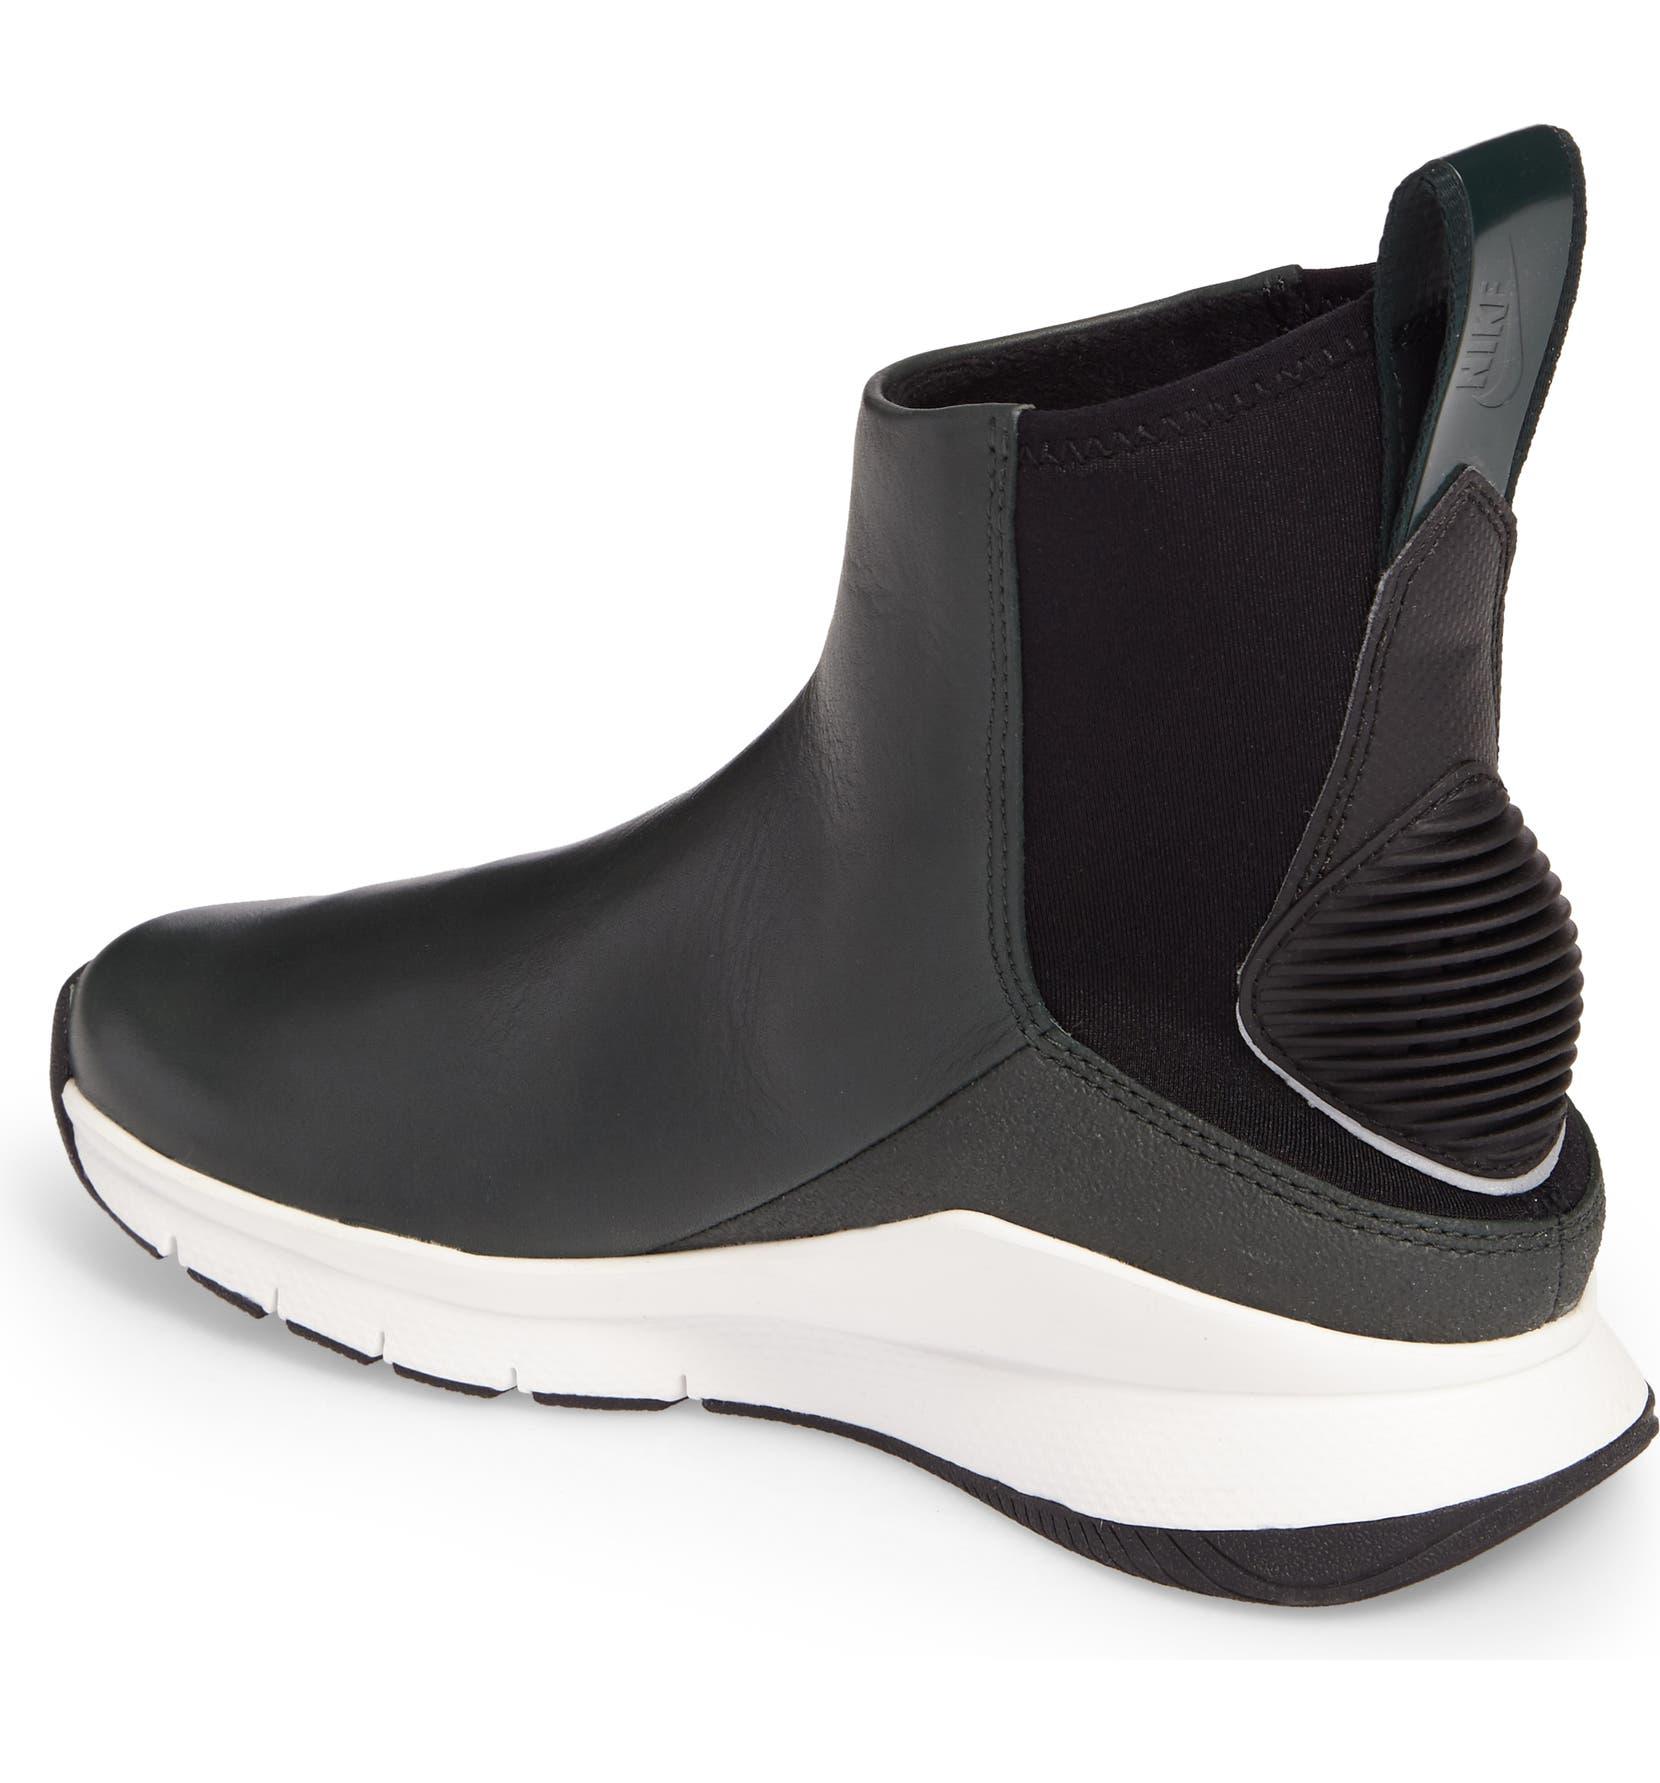 huge selection of f3c3d acce5 Nike Rivah High Premium Waterproof Sneaker Boot (Women) | Nordstrom